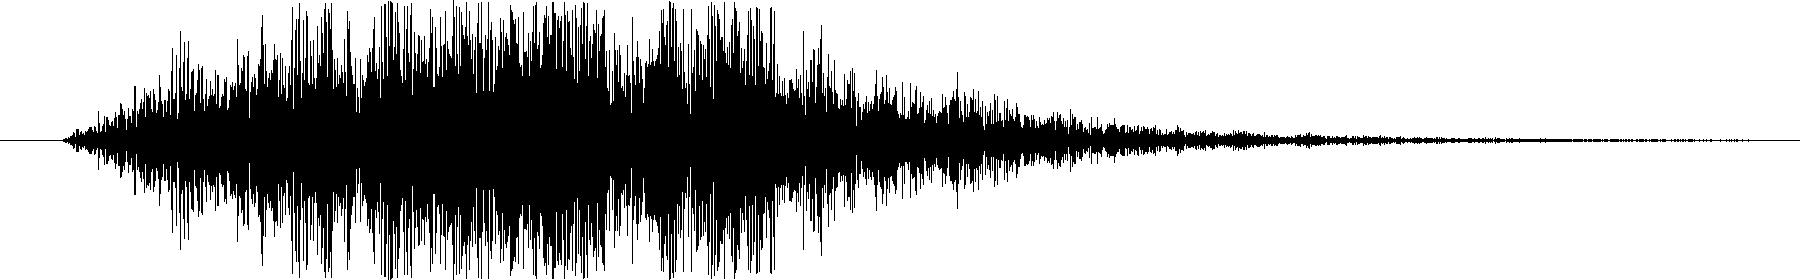 drive sound2